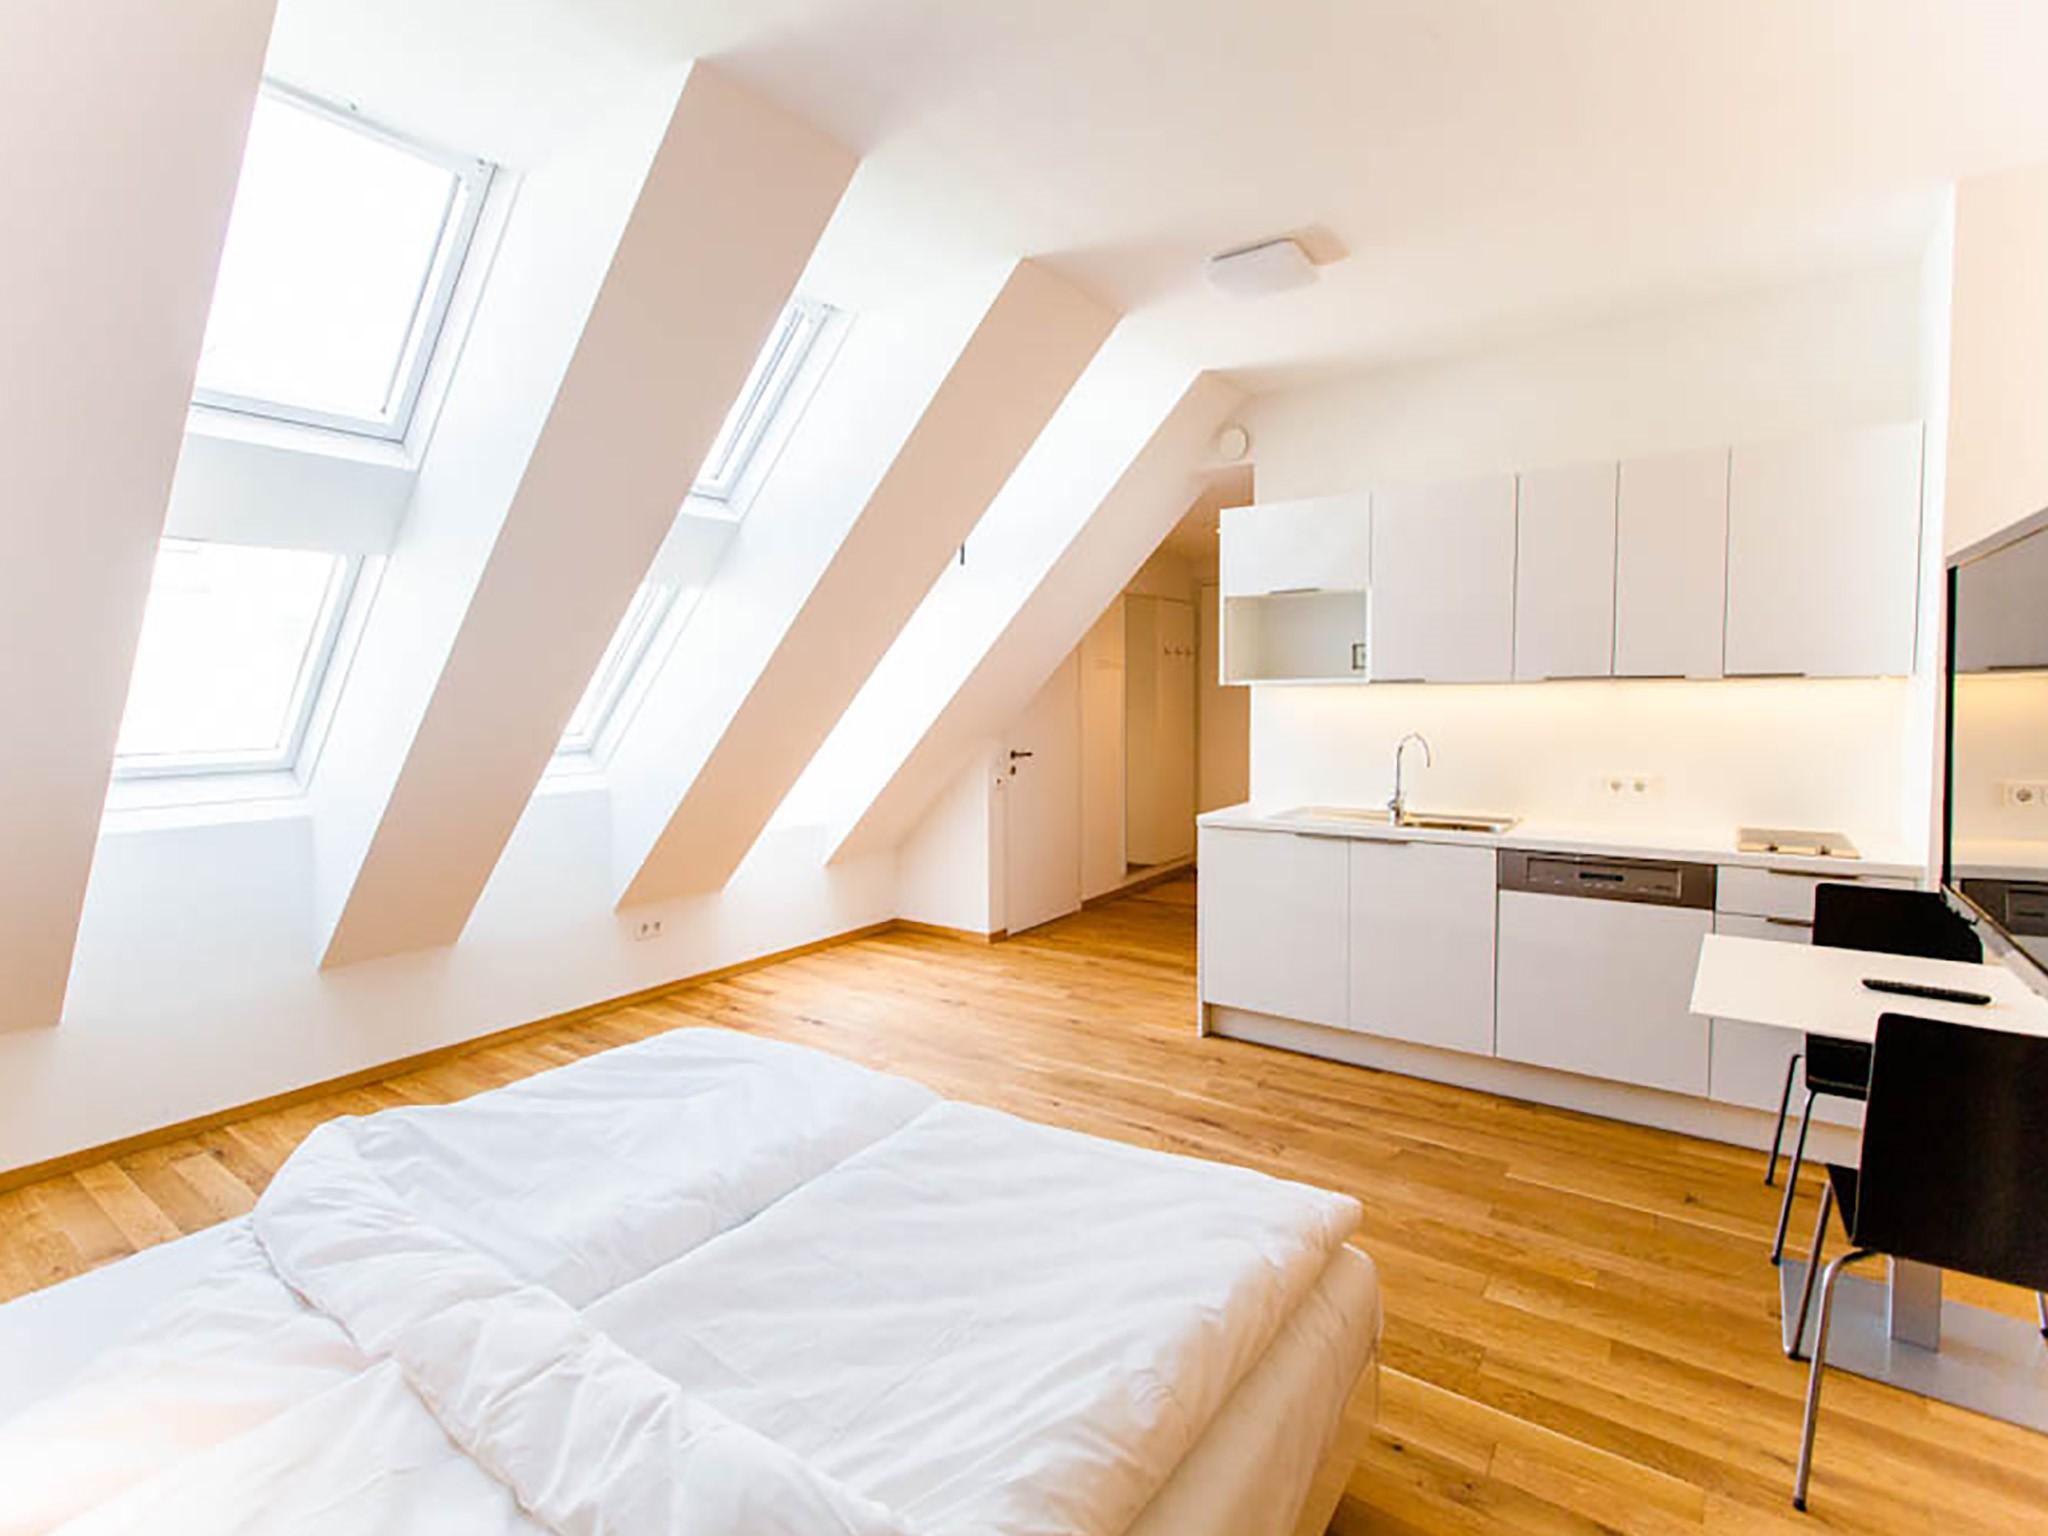 Apartment Plus 38A Wohnraum Hauptfoto